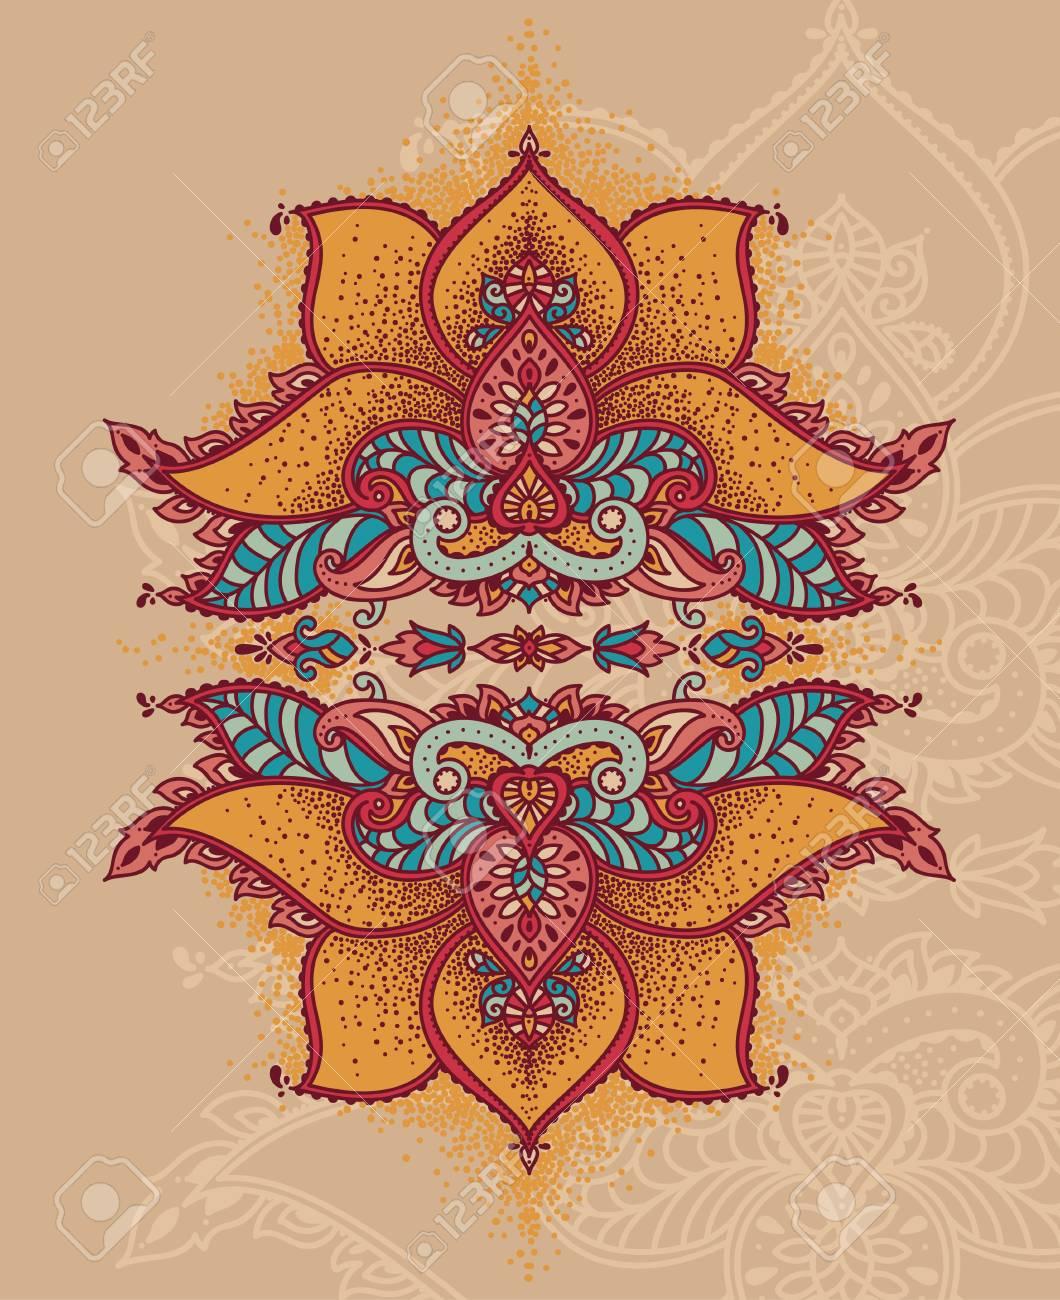 Royal magical ornament stylized lotus flower in indian style royal magical ornament stylized lotus flower in indian style can be used for tattoo izmirmasajfo